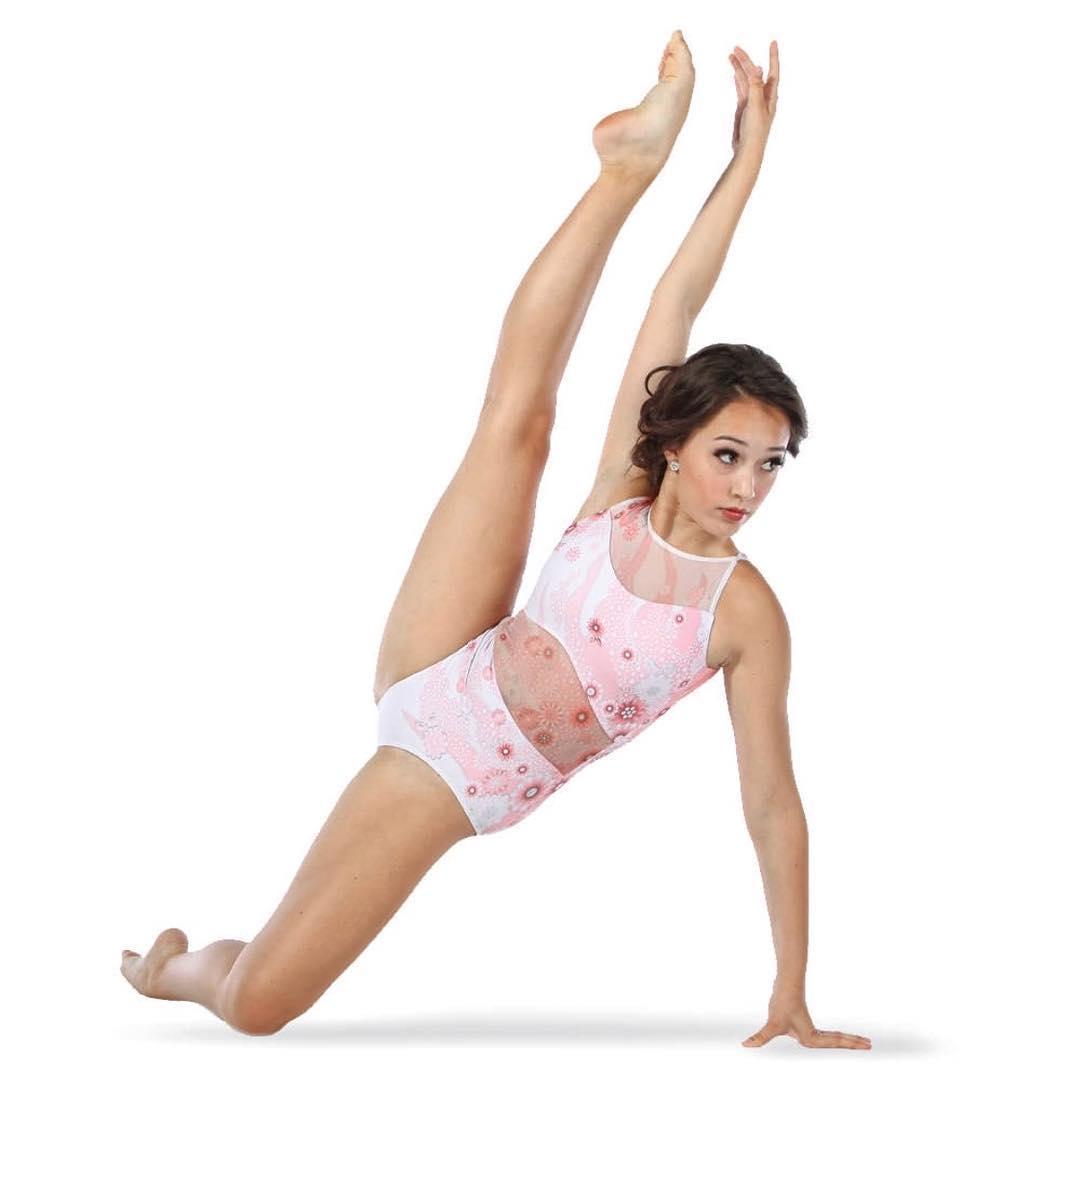 cb3b7bf5639 Just For Kix : Dancewear, Dance Clothes, Dance Shoes, Dance Classes ...